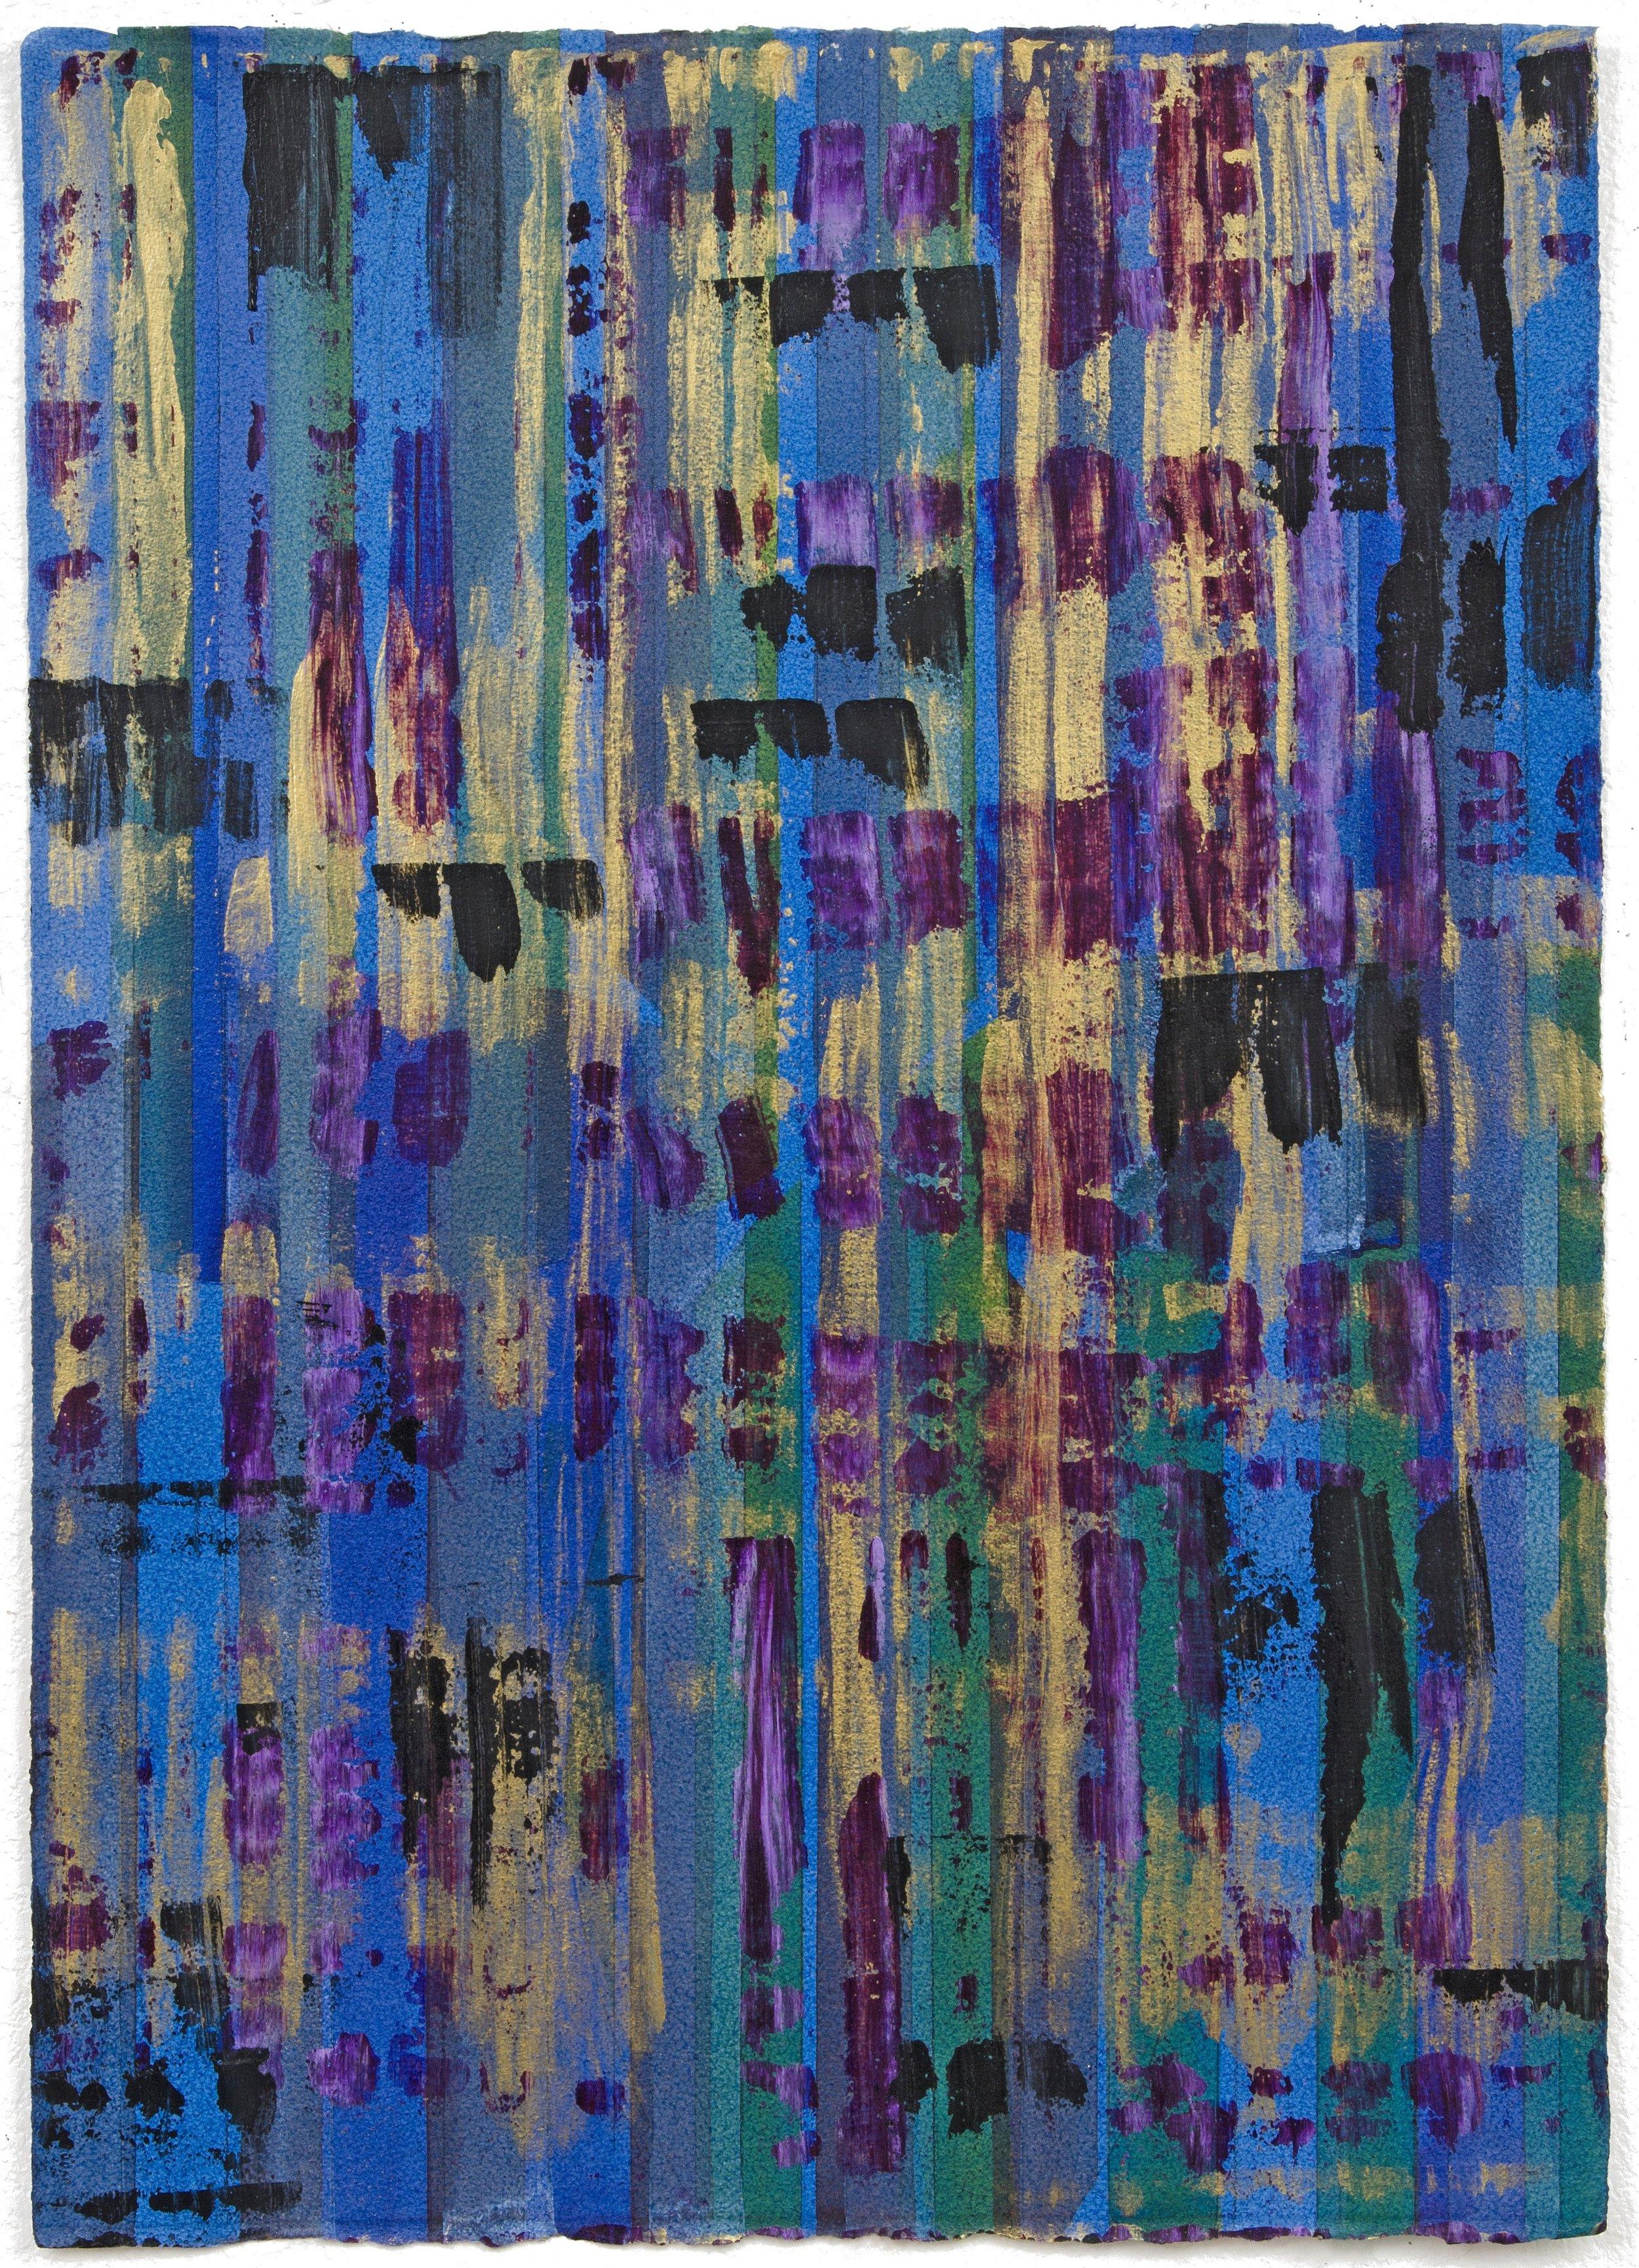 "Liminal Spaces 123 Elizabeth Chandler EC1104 Acrylic on Paper 40"" x 30"""